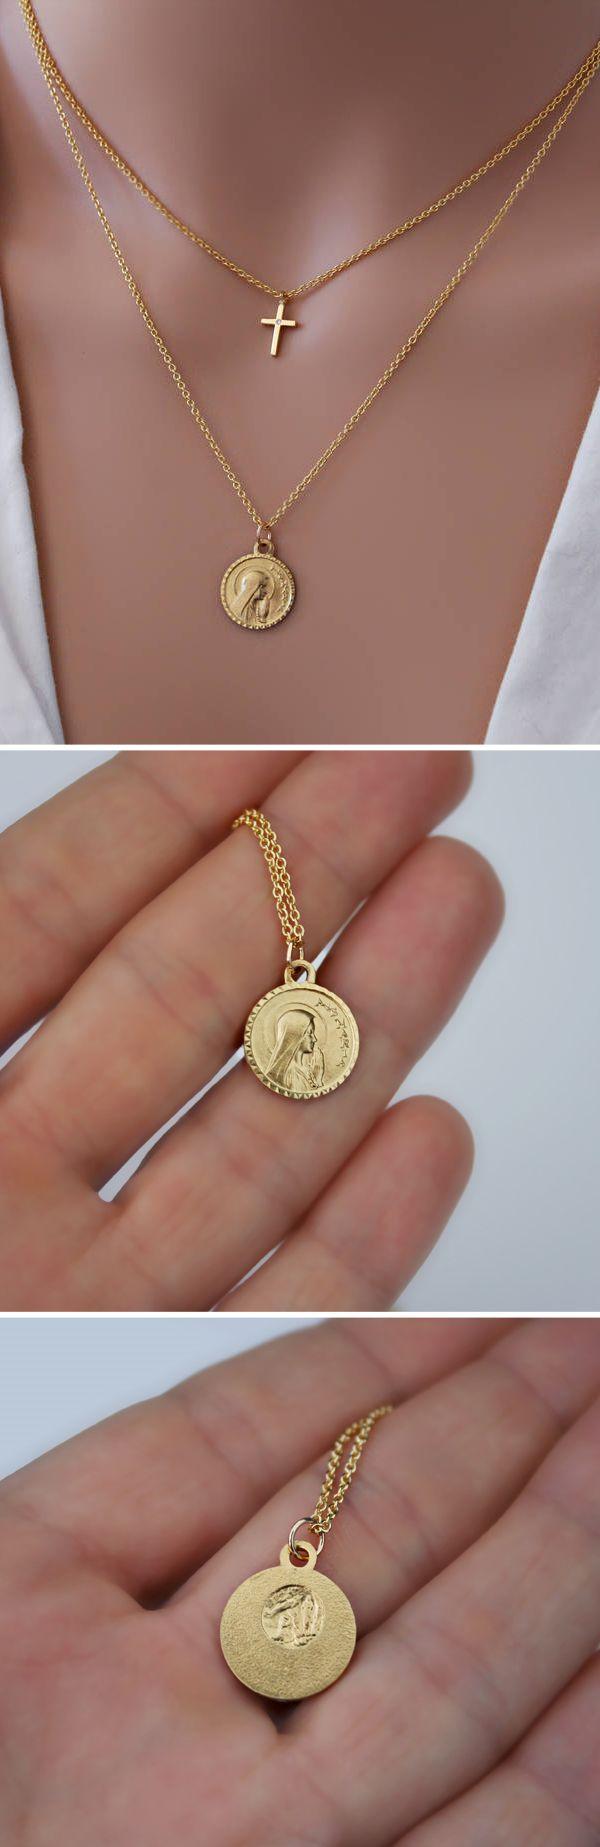 #collier #bijoux #bijou #religieux #médaille #religieuse #pendentif #croix #sainte #saint #cross #zirconia #zirconium #crystal #cristal #jewellery #jewelry #etsy #handmade #french #religious #medal #medals #chains #gold #plated #16k #plaque #or #minimalist #notre #dame #de #lourdes #our #lady #of #lourdes #virgin #mary #vierge #marie #jesus #christ #cadeau #mariage #mariee #wedding #present #gift #bridal #bride #catholic #christian #chretien #chretienne #catholics #christians #catholique